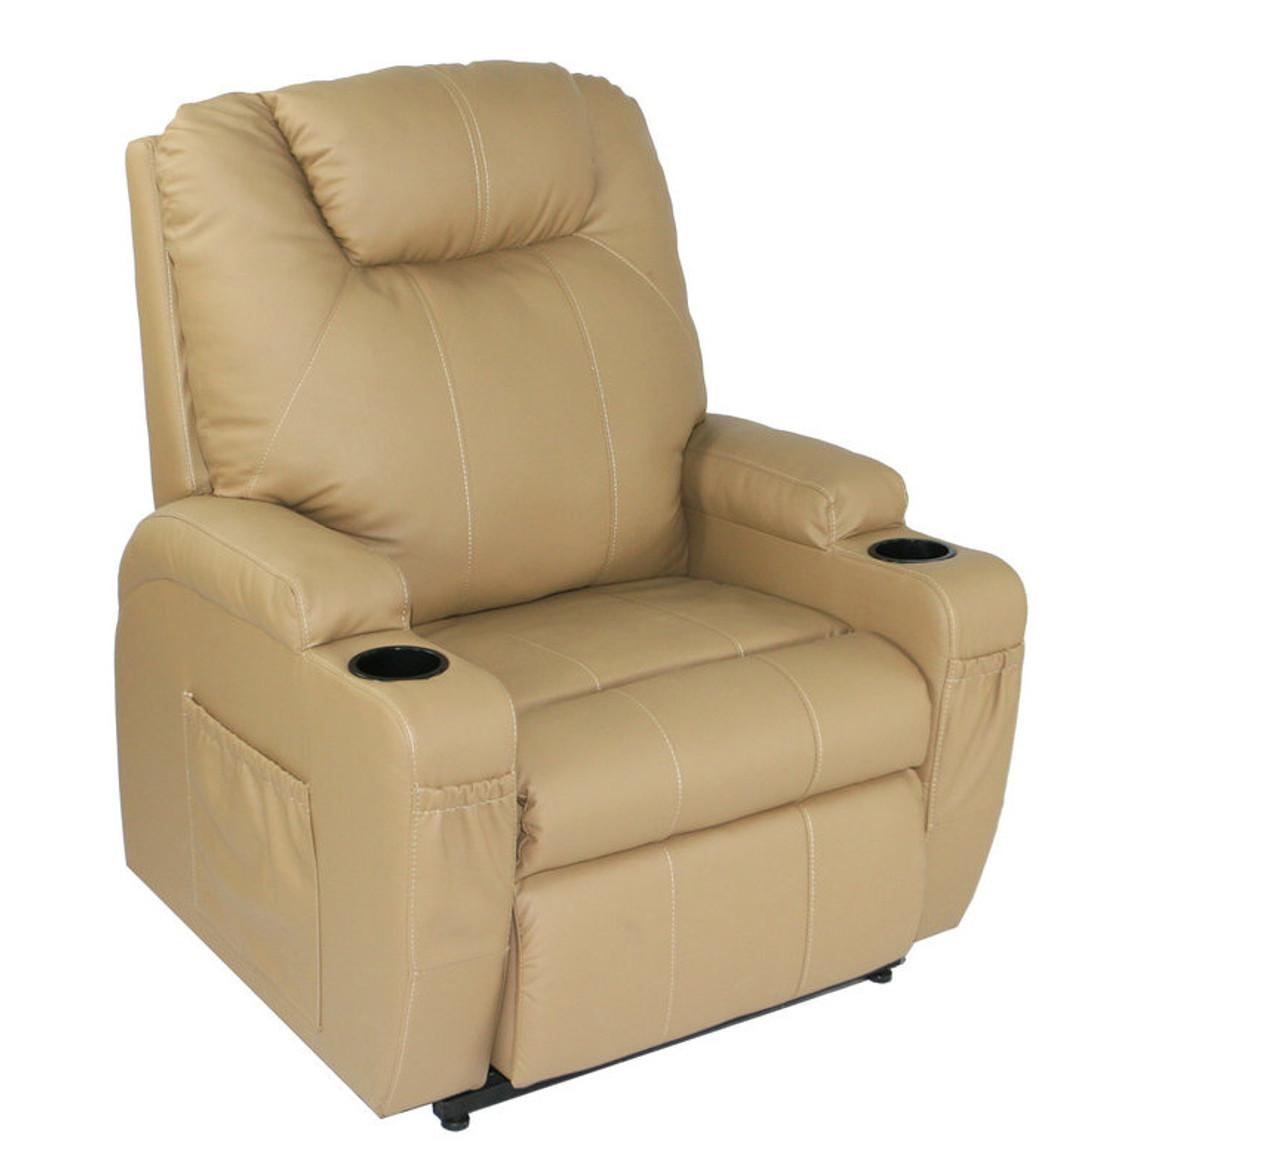 Adjust4me Brand Tucana Electric Lift Chair